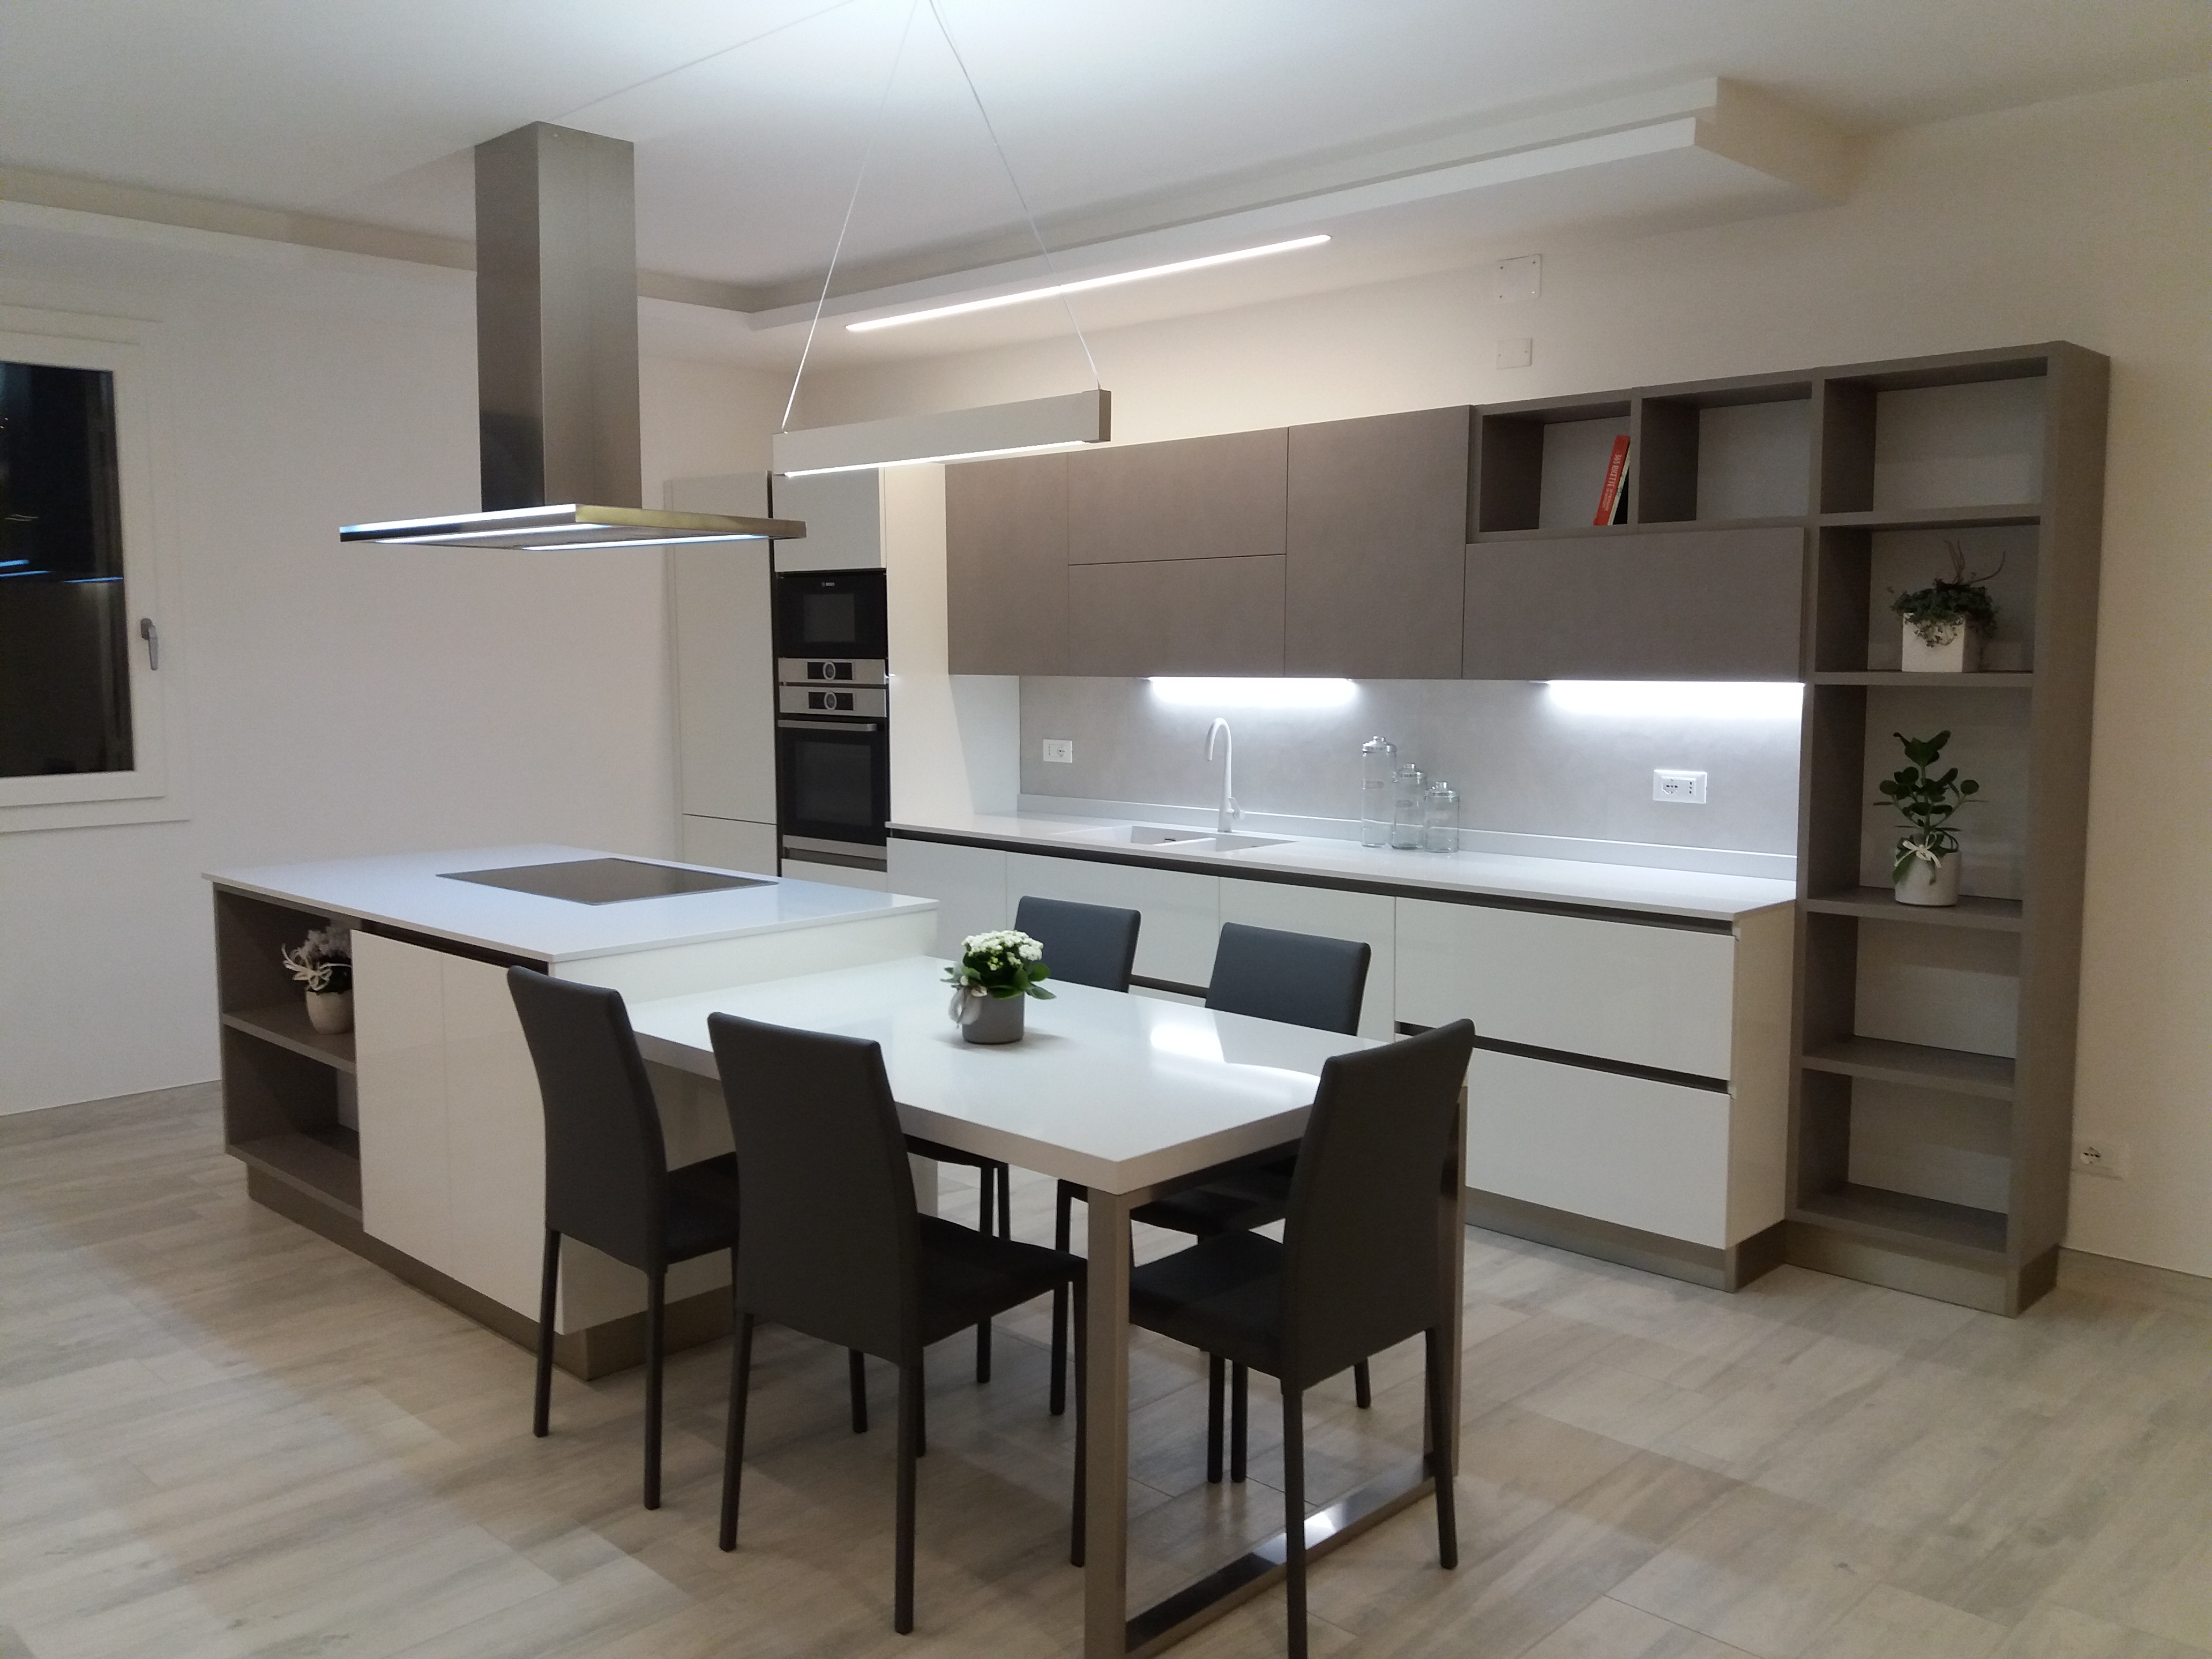 Cucina -OYSTER LACCATA- Veneta Cucine